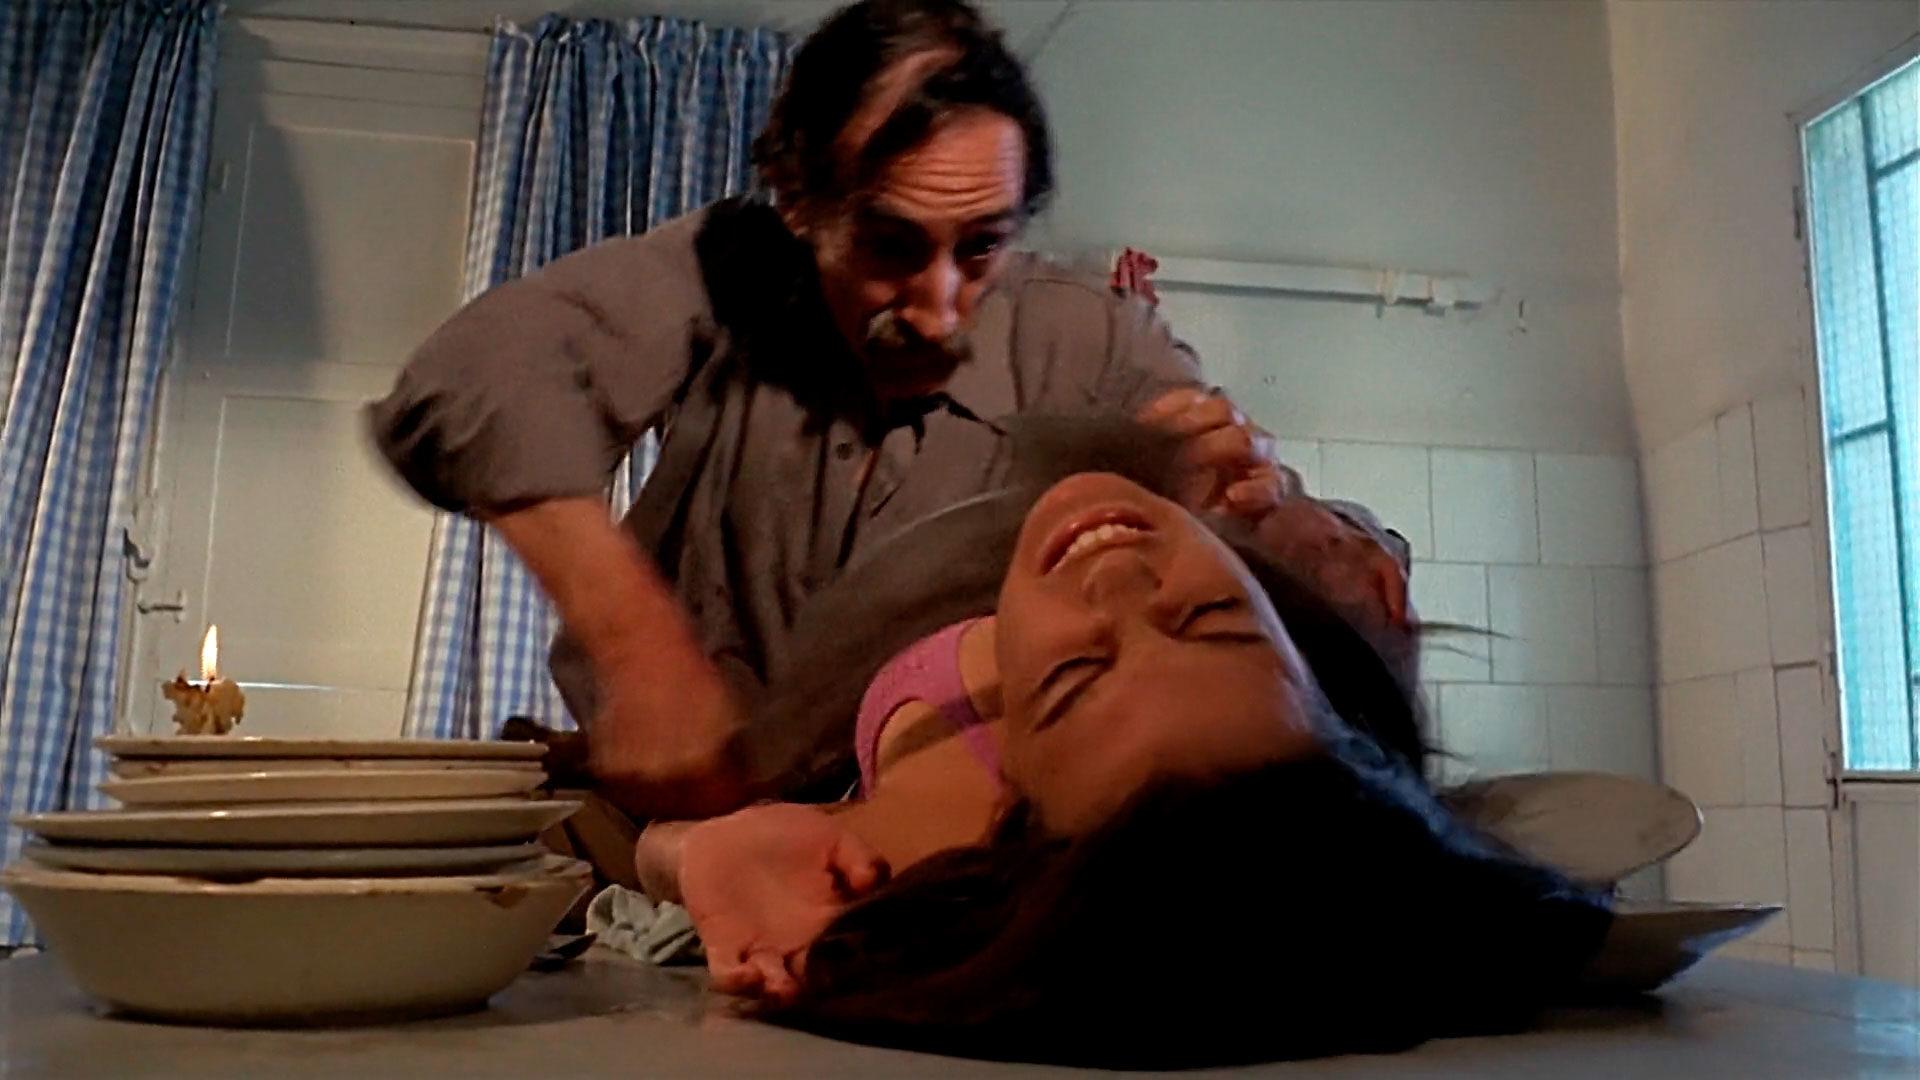 Ужас из могилы / Ужас выходит из склепа / El espanto surge de la tumba / Horror Rises From The Tomb (1973 Карлос Ауред)